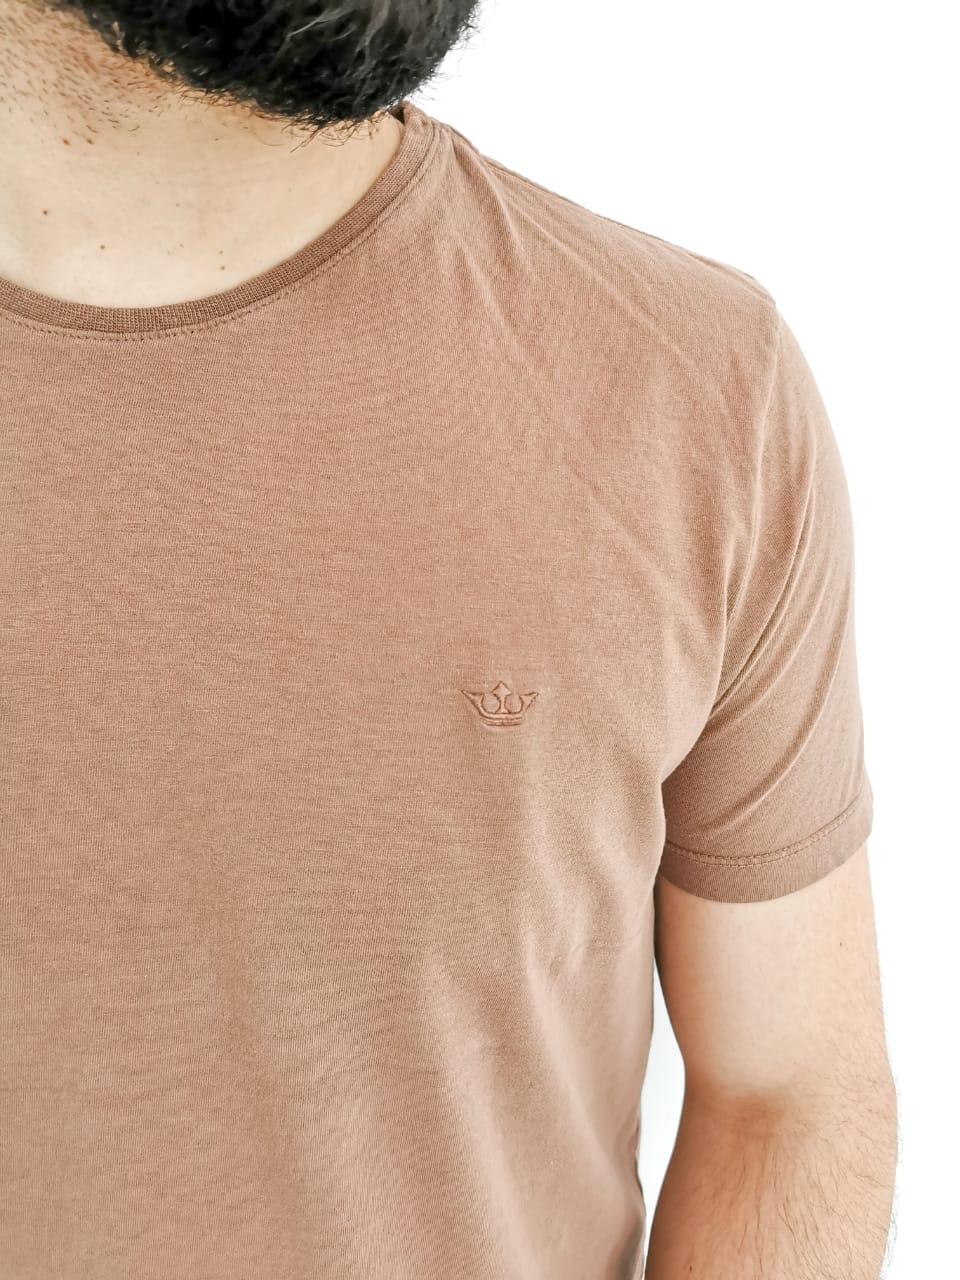 Camiseta Docthos Básica Marrom